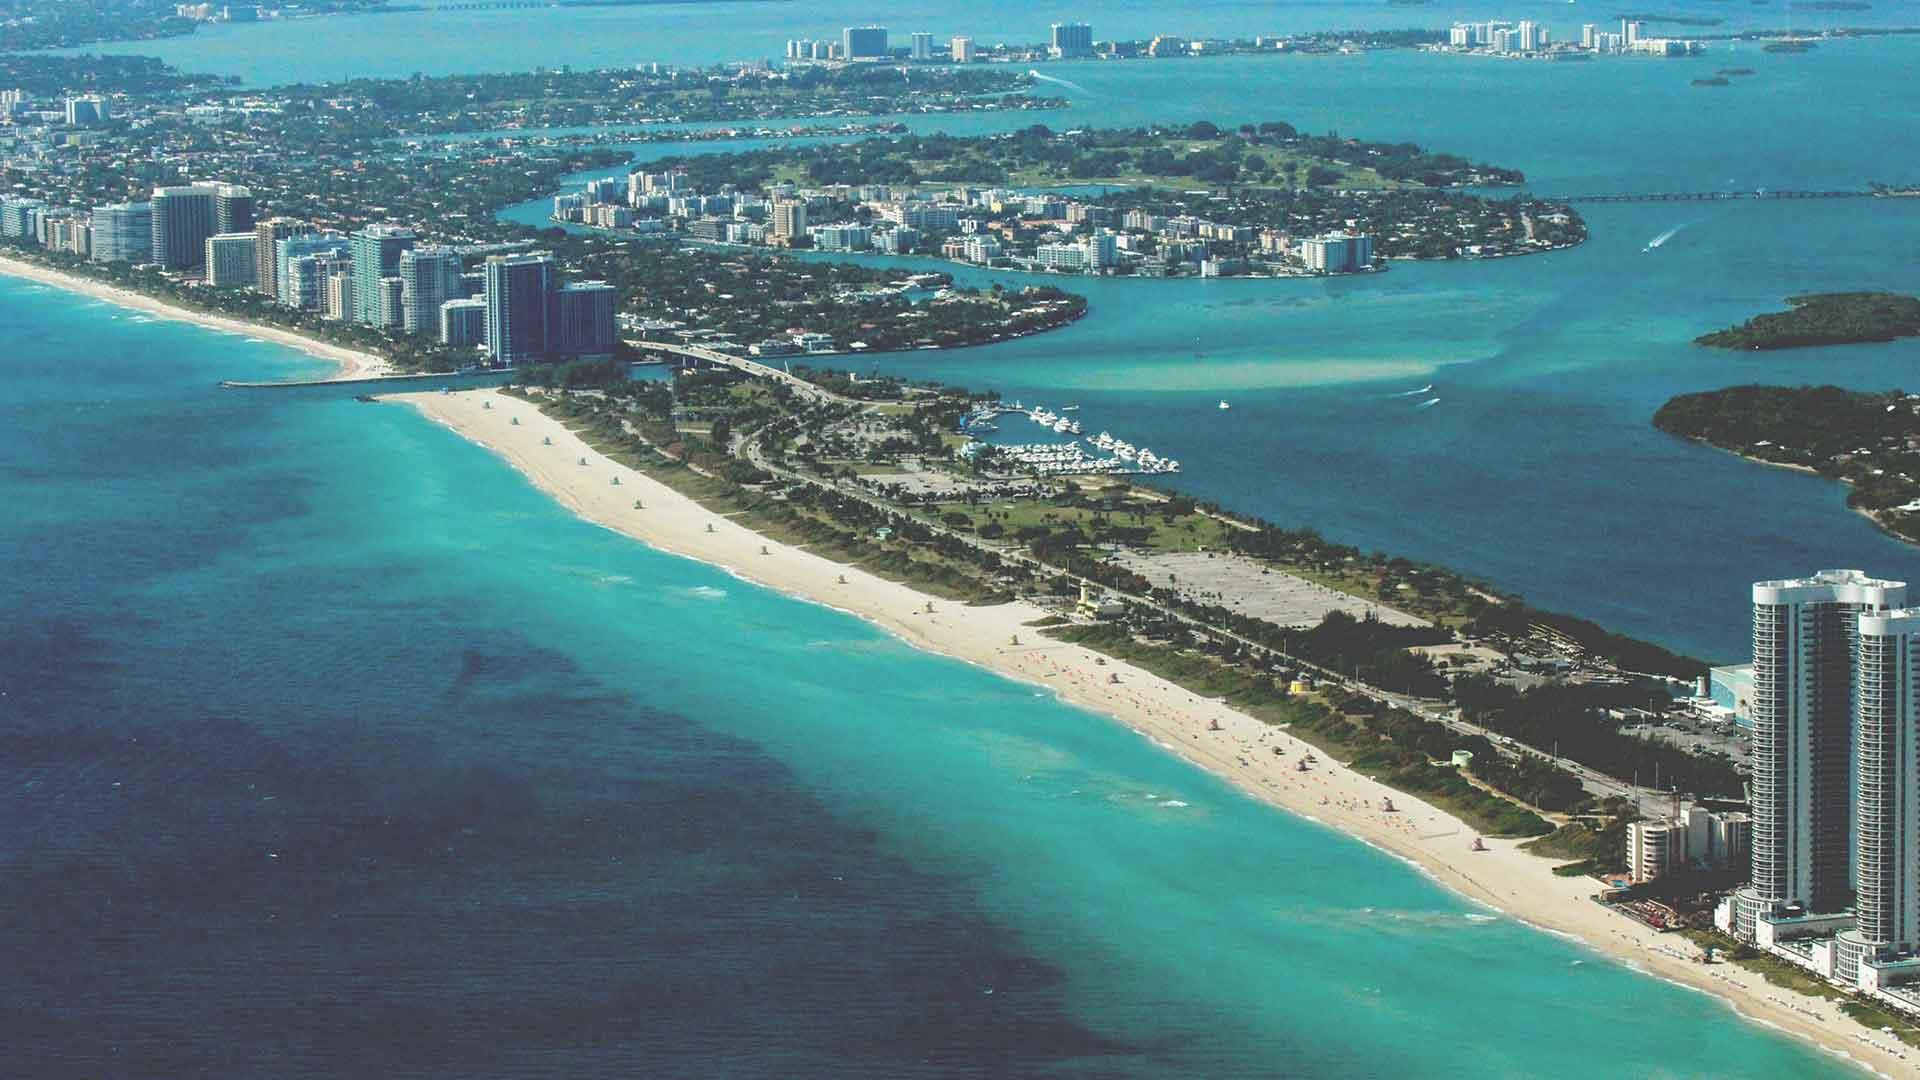 Florida Foto 1